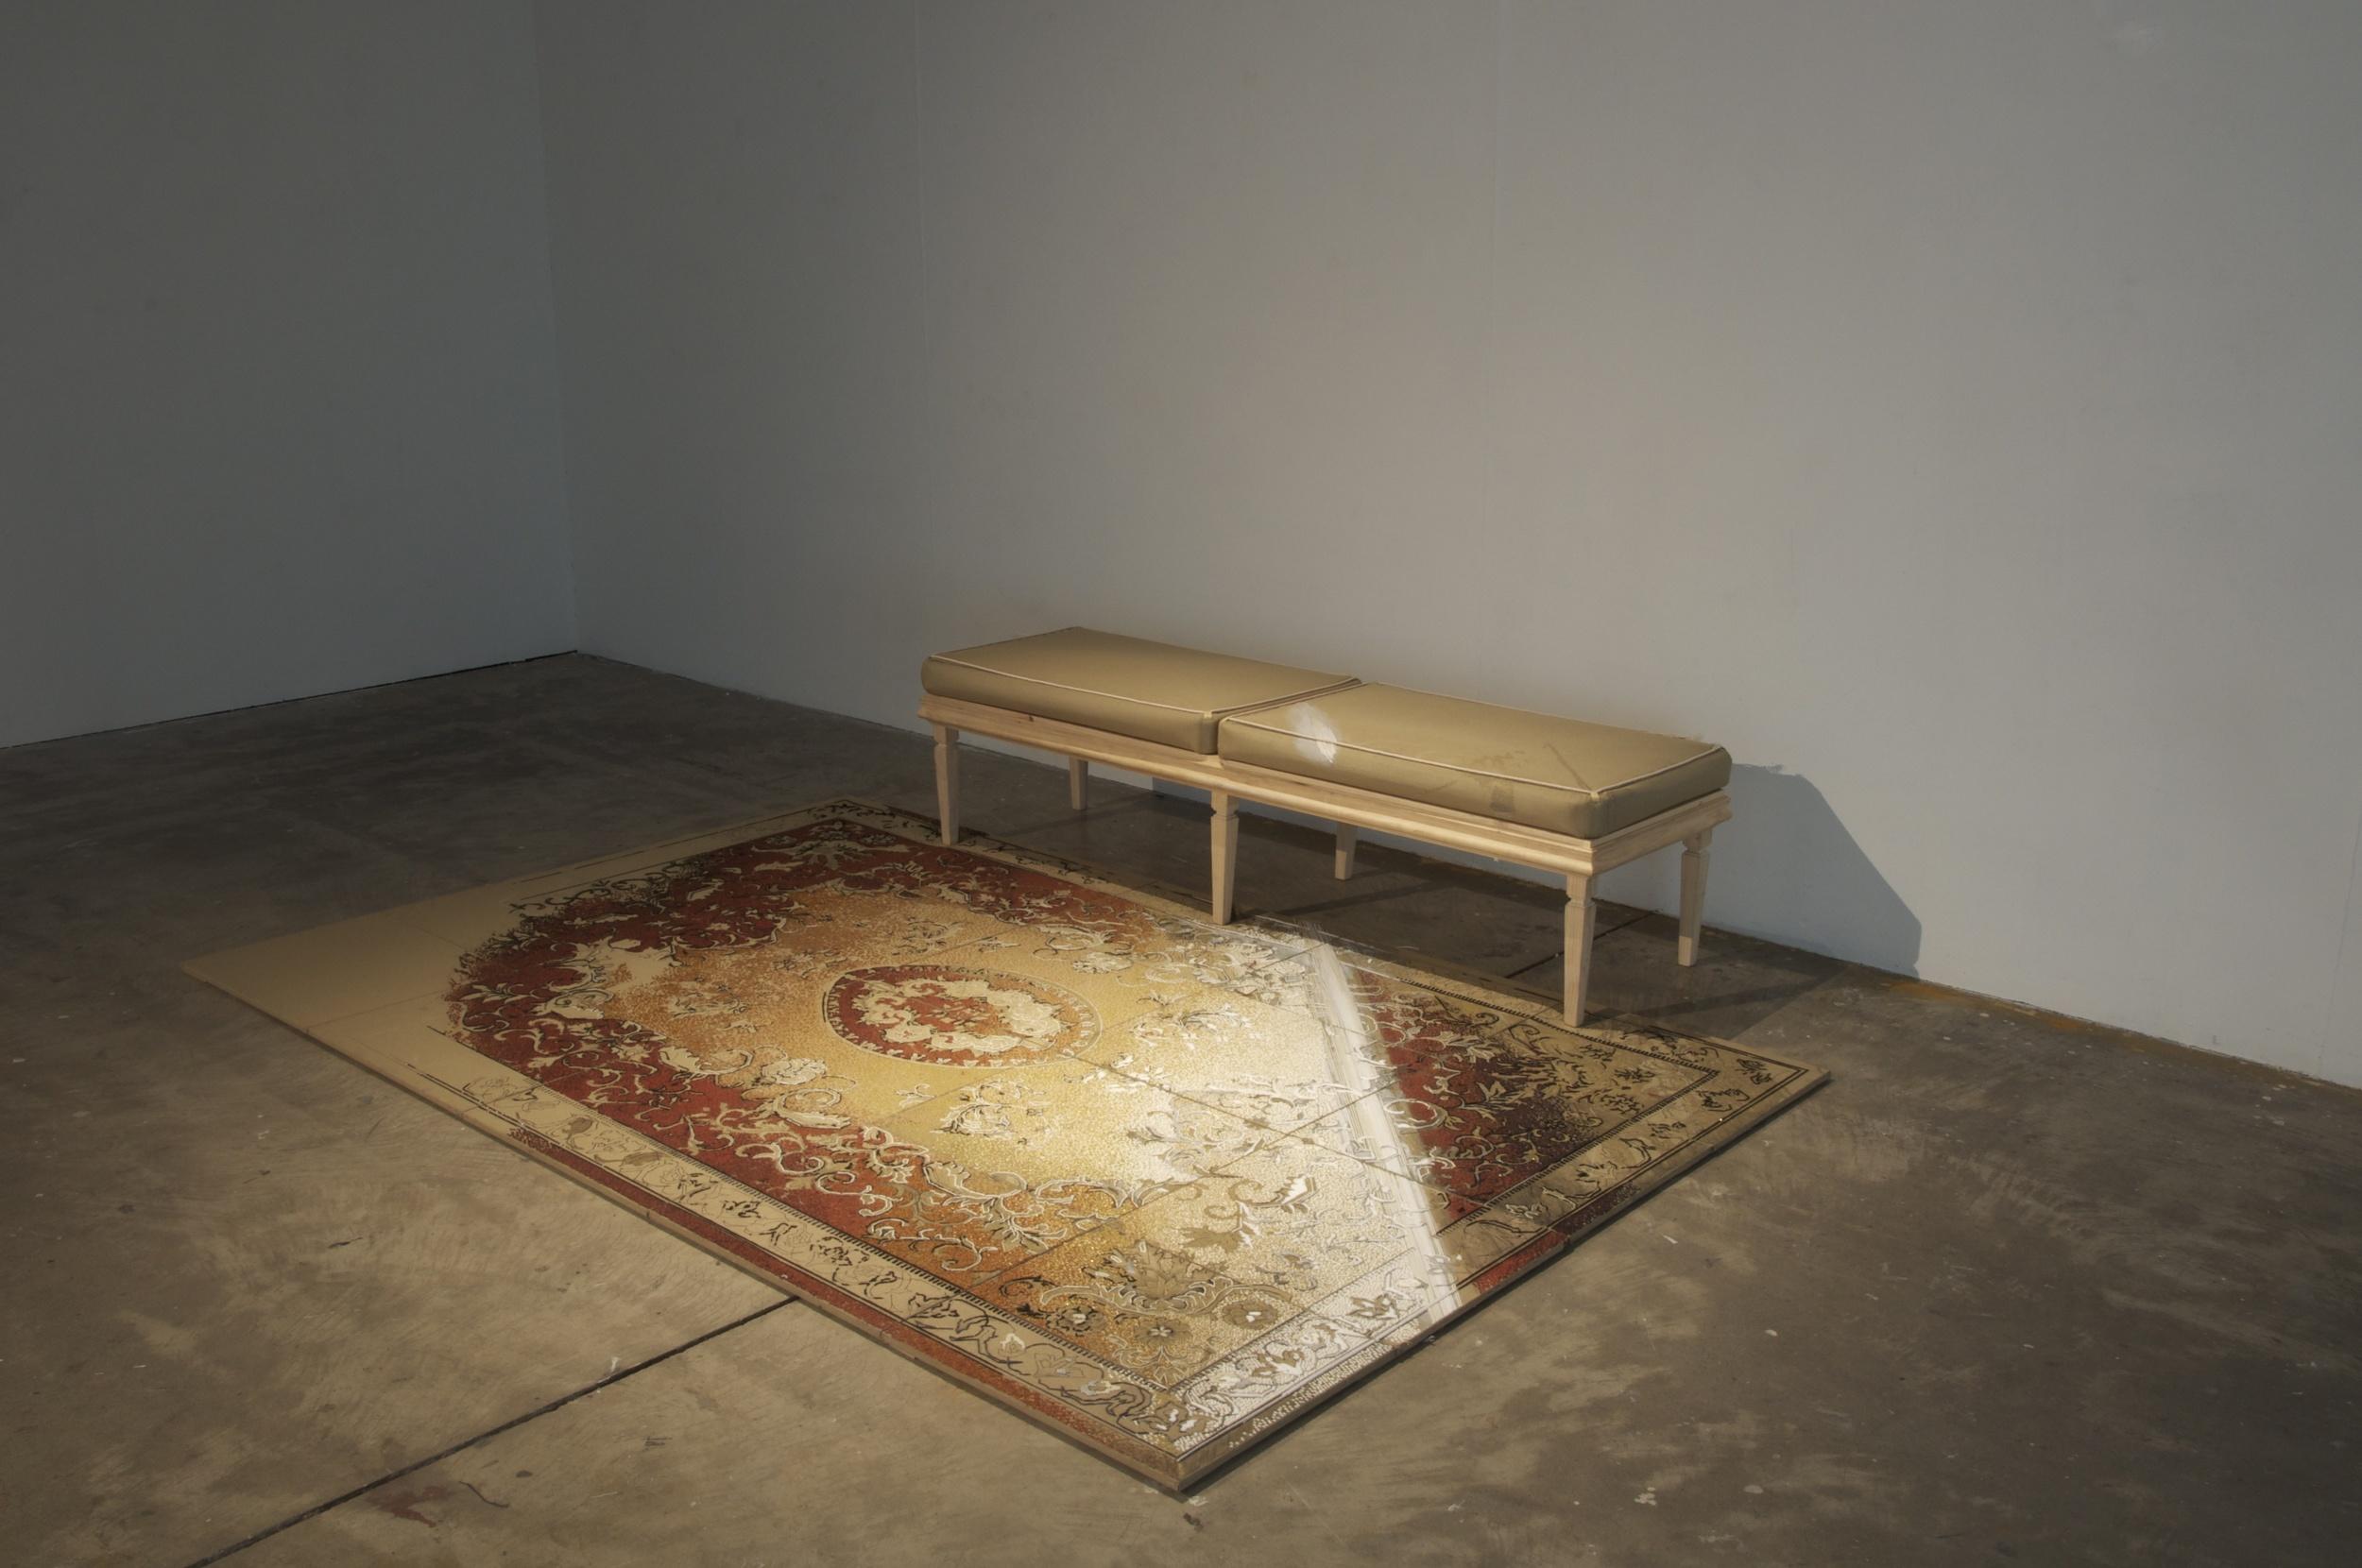 8.Georgina Cue, Versailles, 2012, Acrylic yarn on tapestry canvas, hard wood and cardboard, 225cm × 170cm × 71cm.jpg